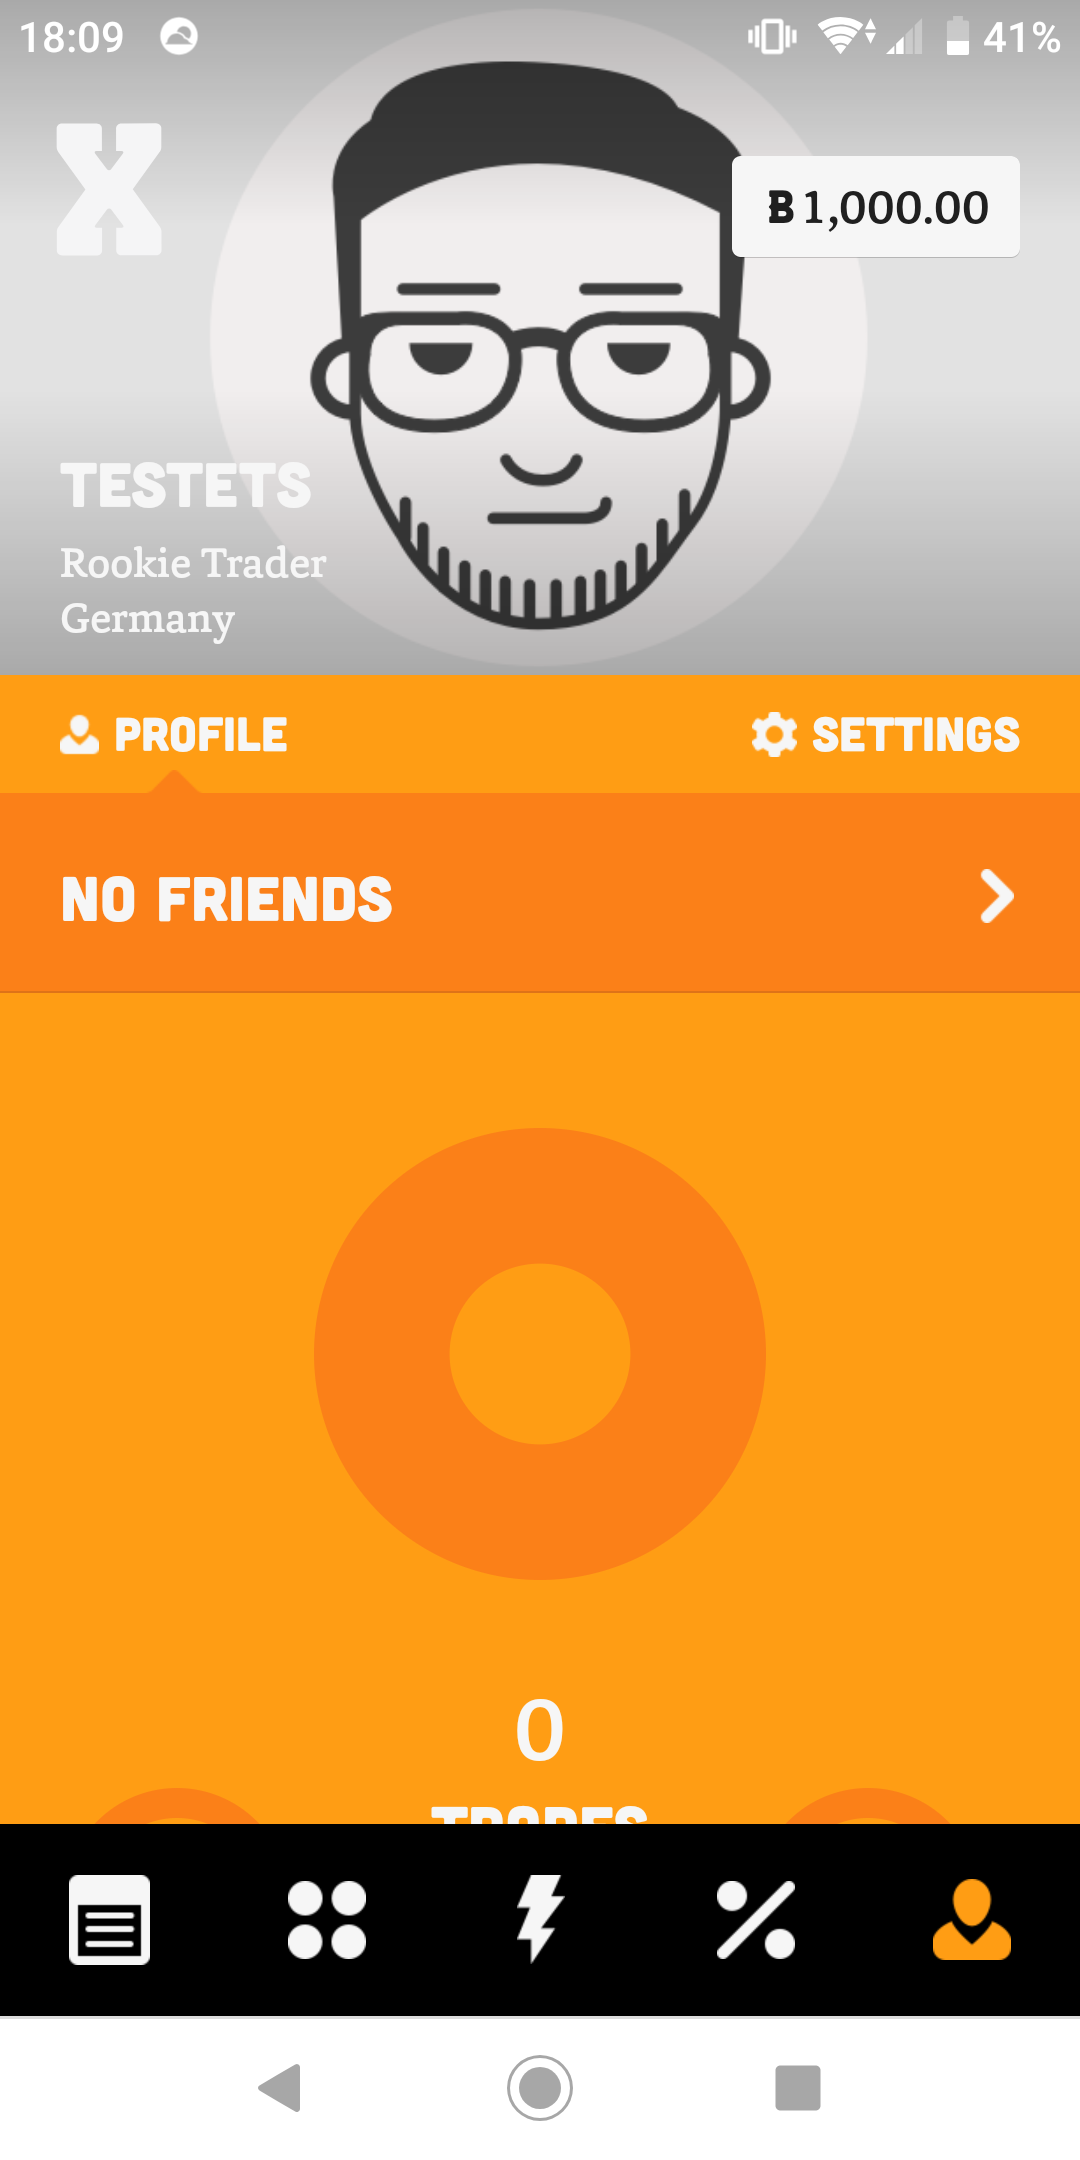 Aplikasi perdagangan saham BUX memberikan gambar profil default untuk semua pengguna baru.